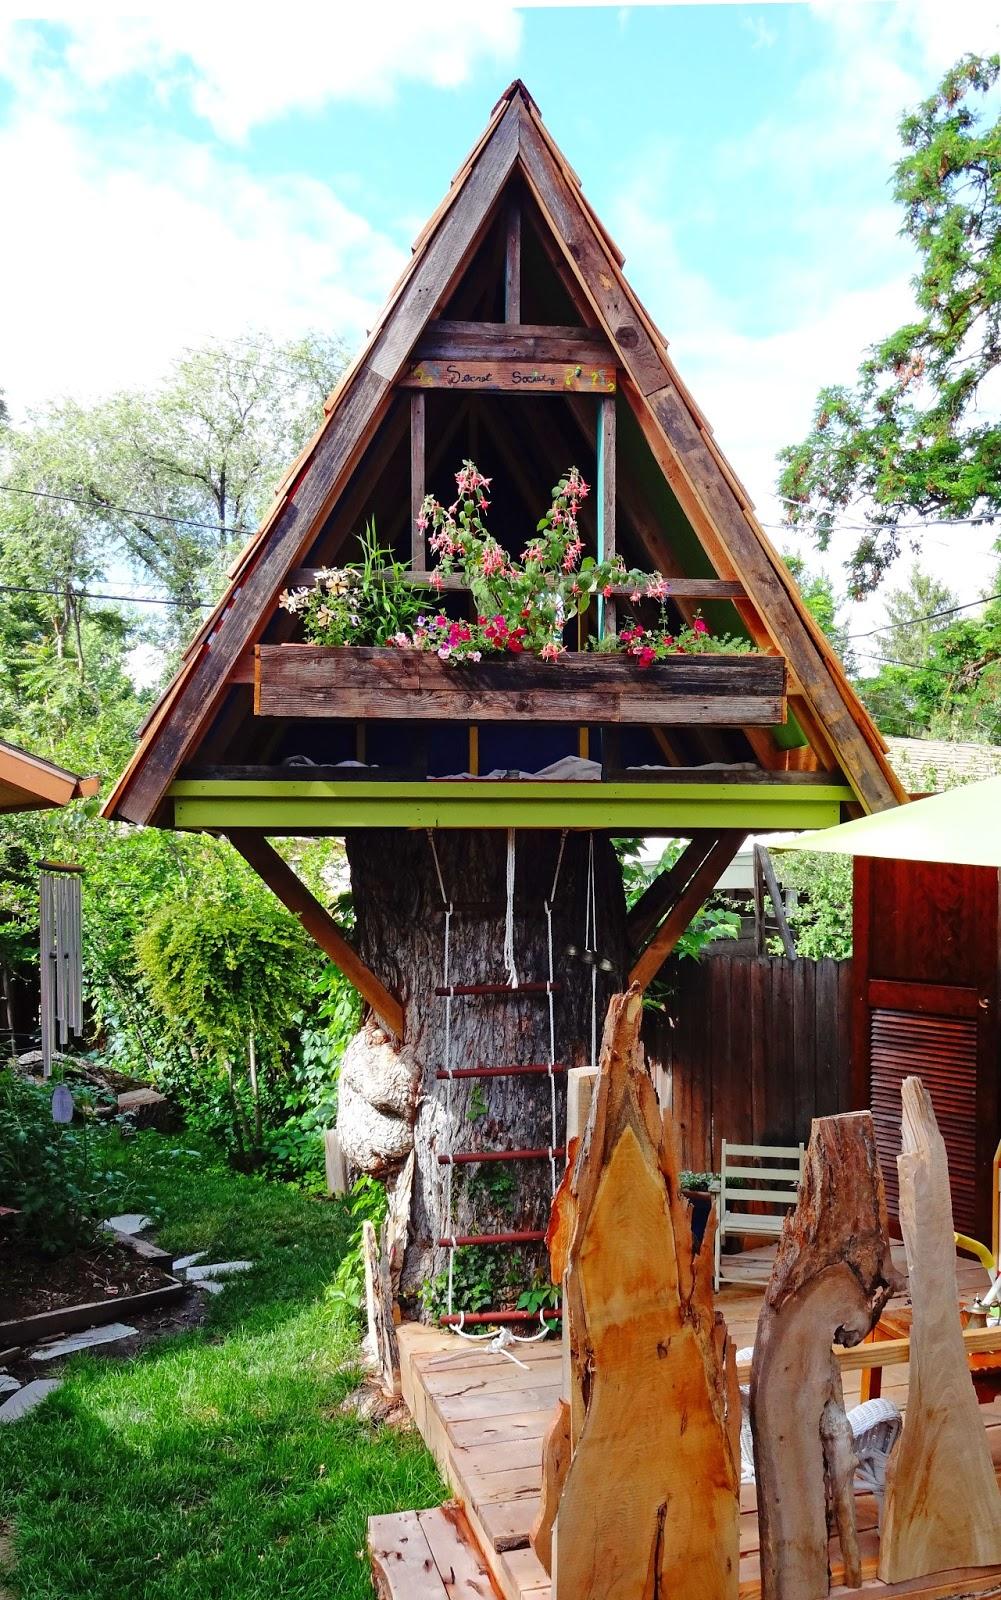 Gnome Tree Stump Home: Boise Daily Photo: June 2013